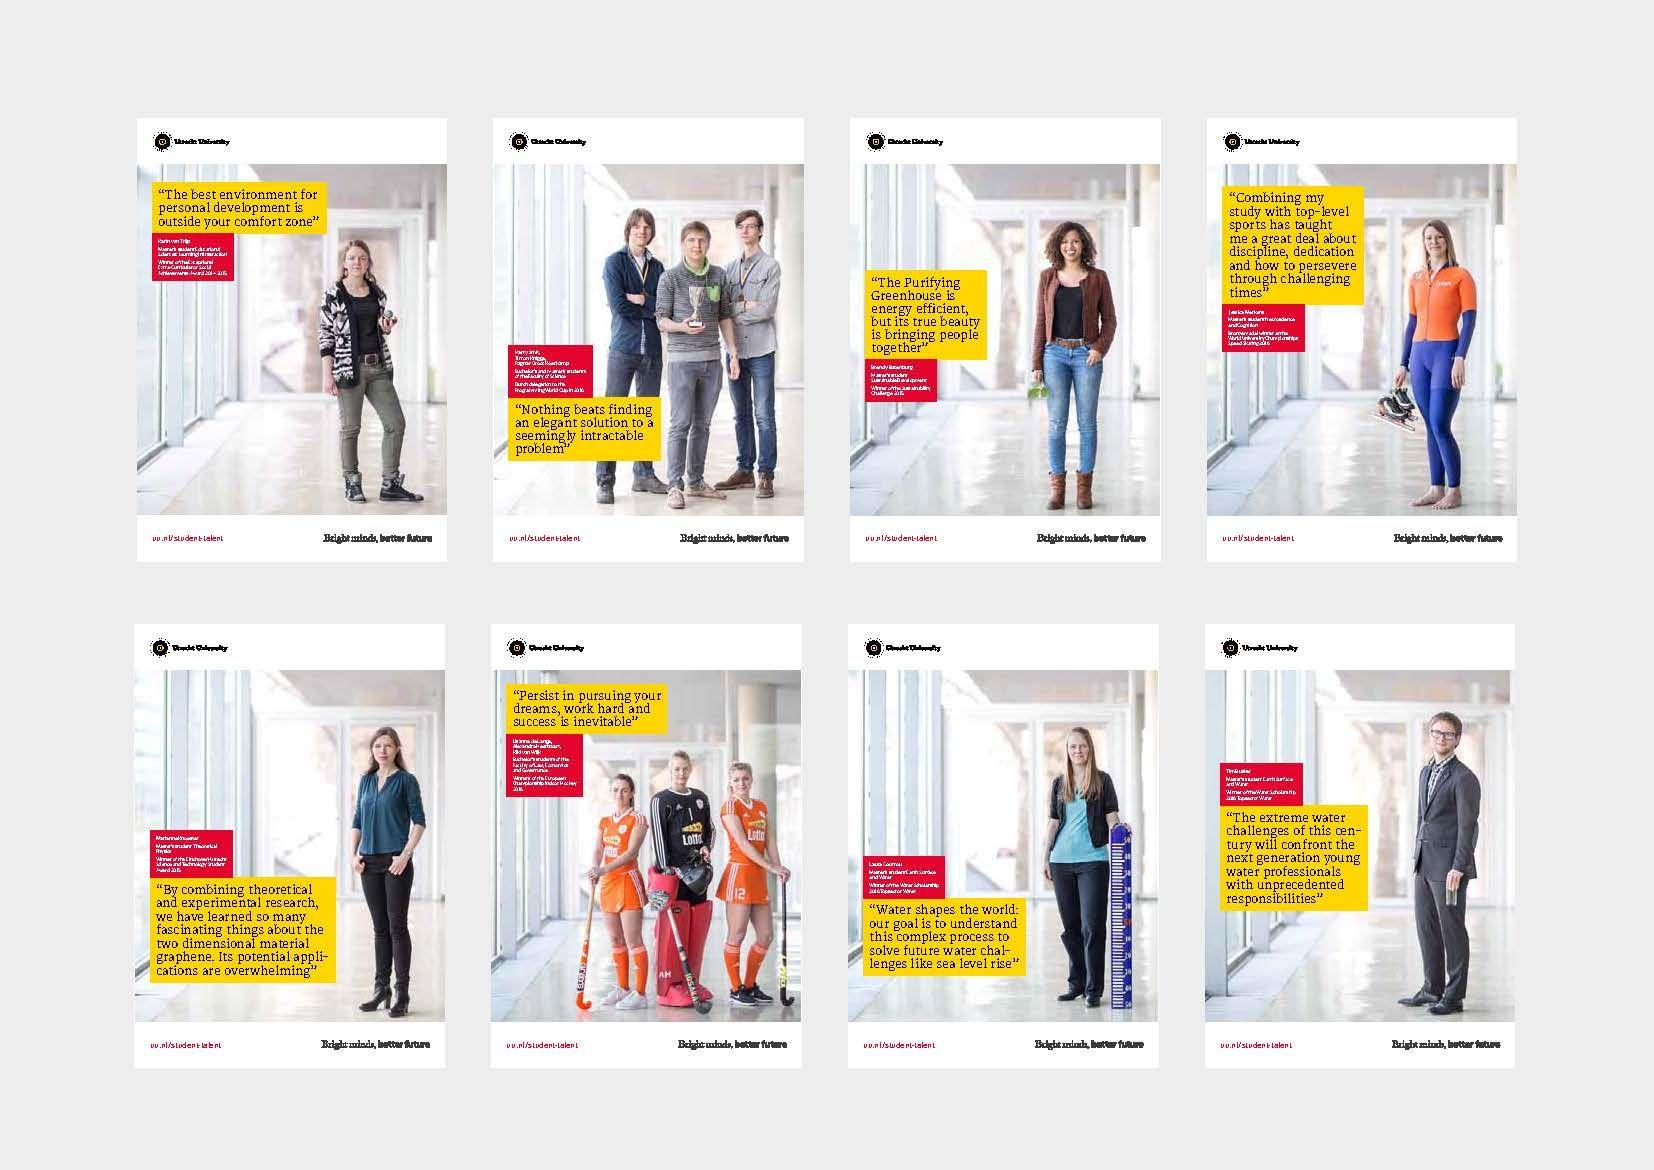 Utrecht university bright minds better future portraits of utrecht university bright minds better future portraits of student talents in hallways toneelgroepblik Image collections